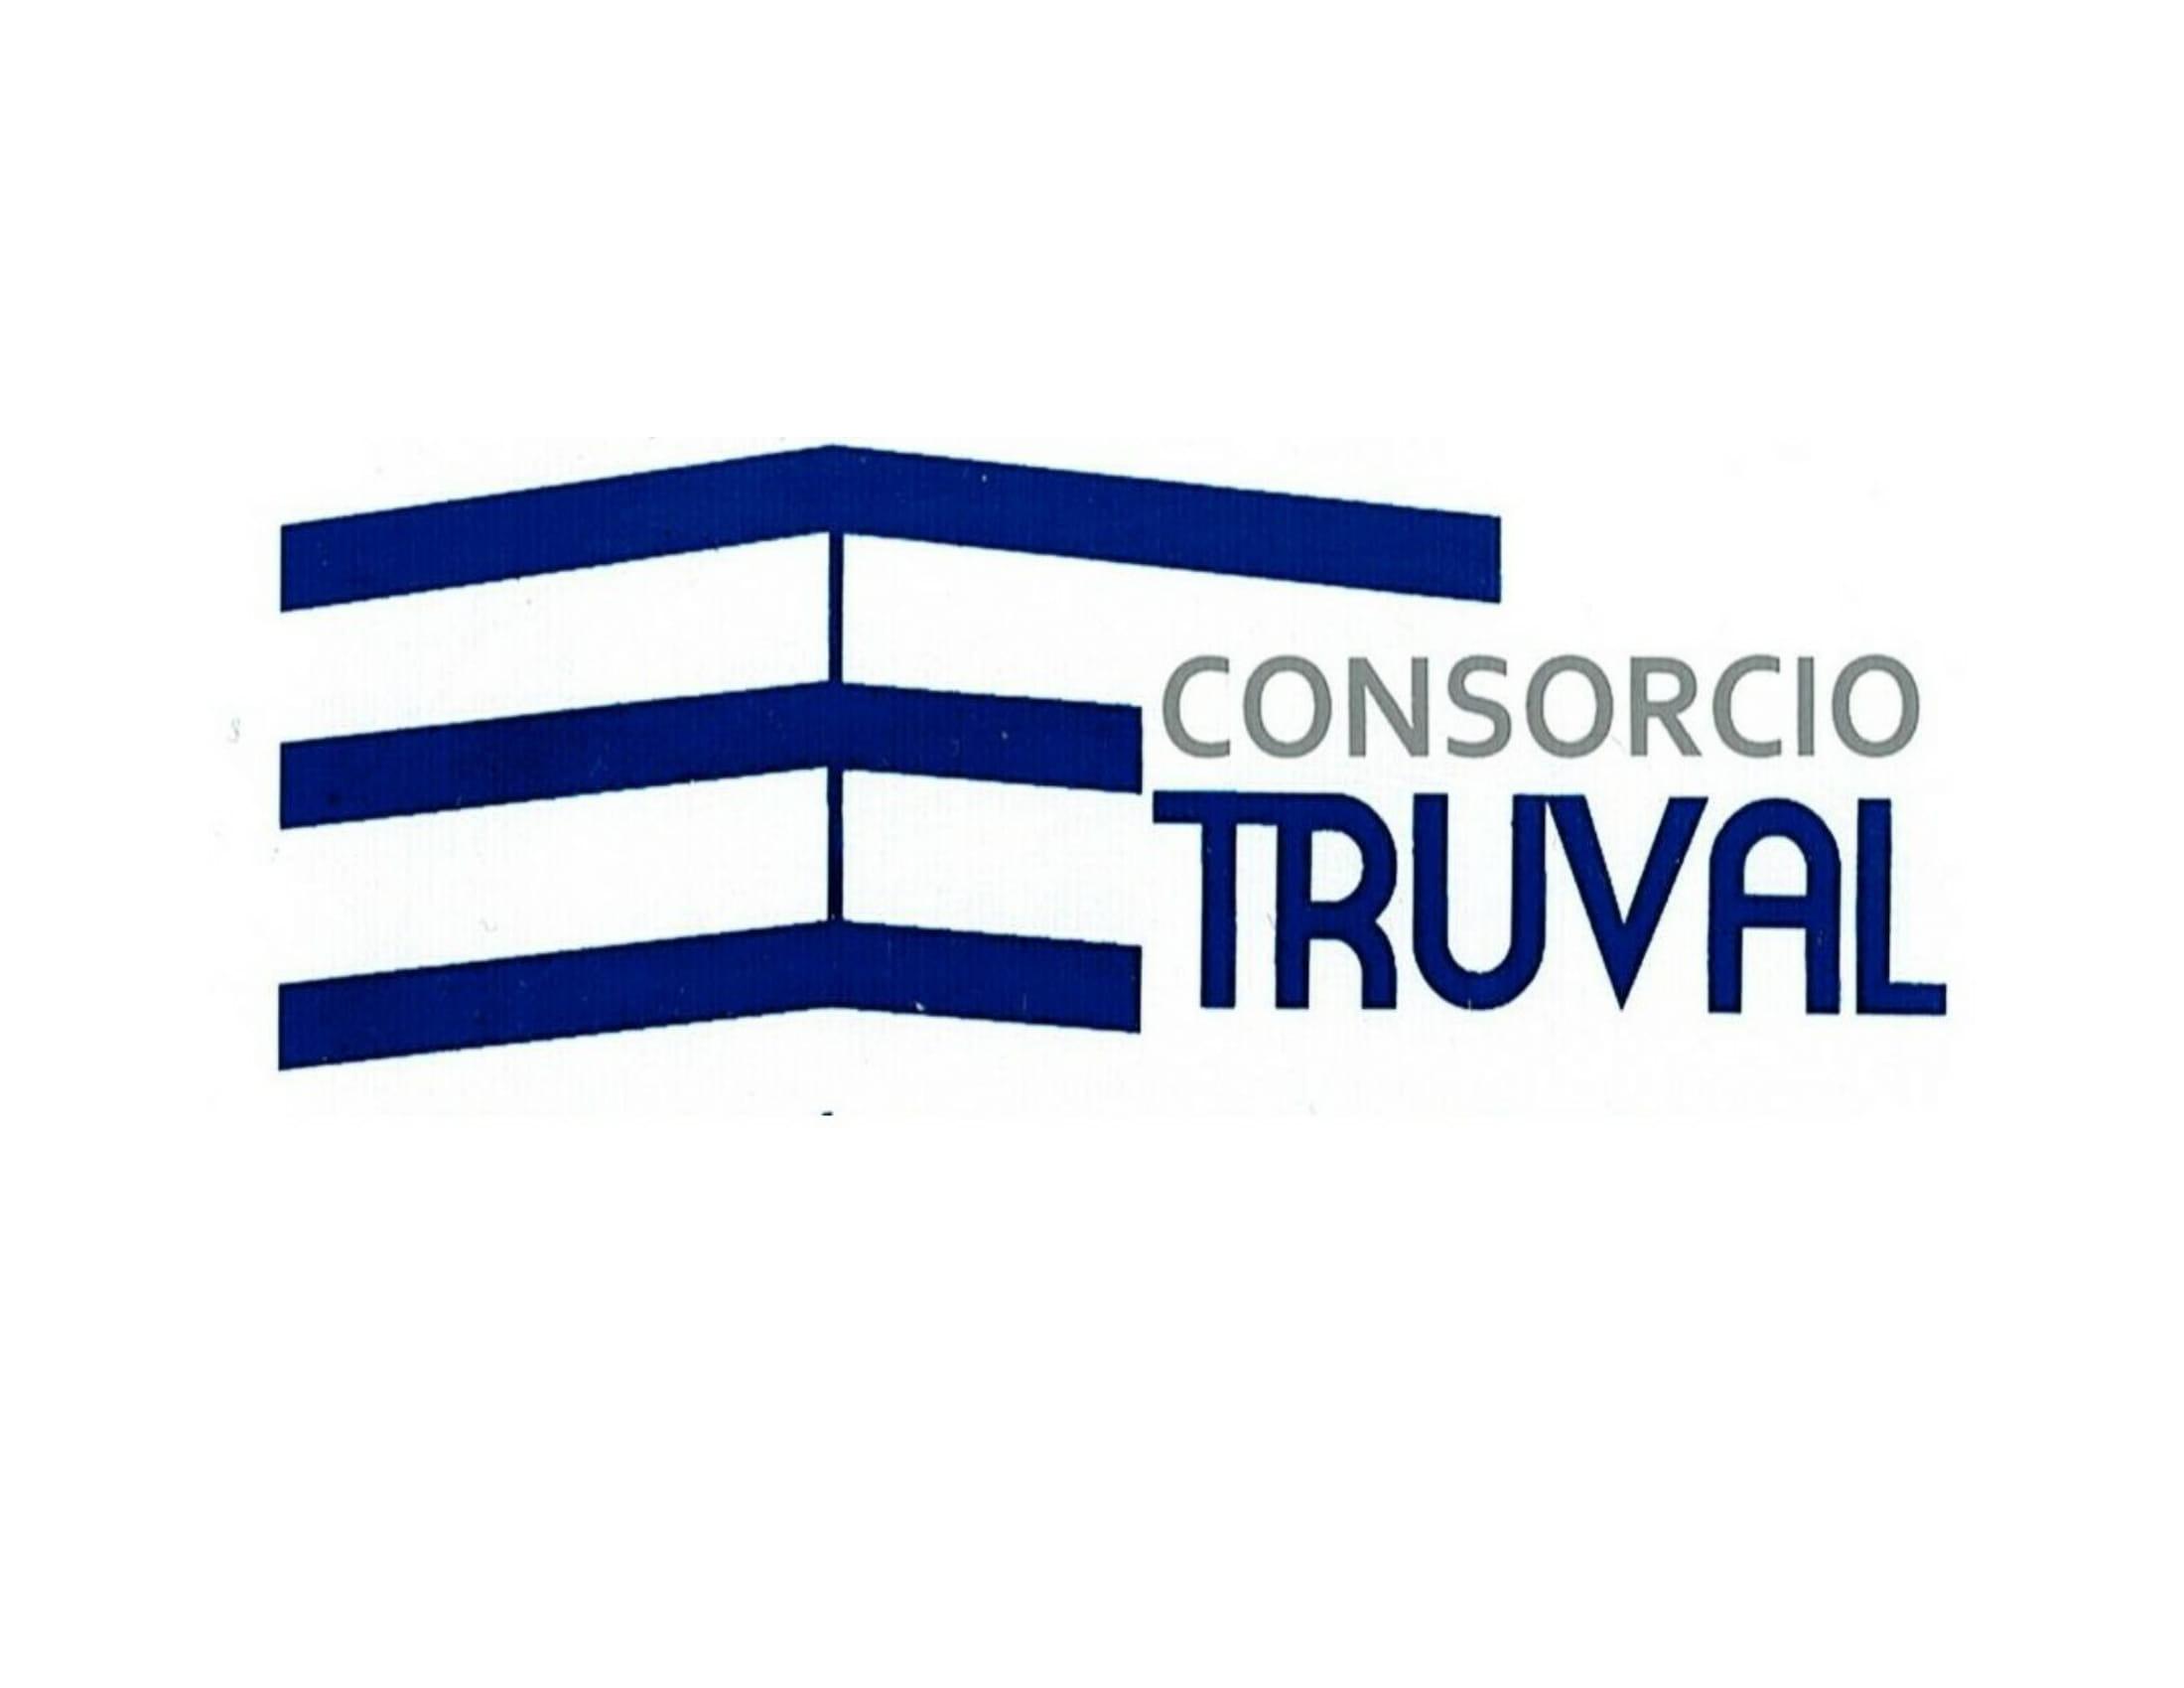 Consorcio Truval